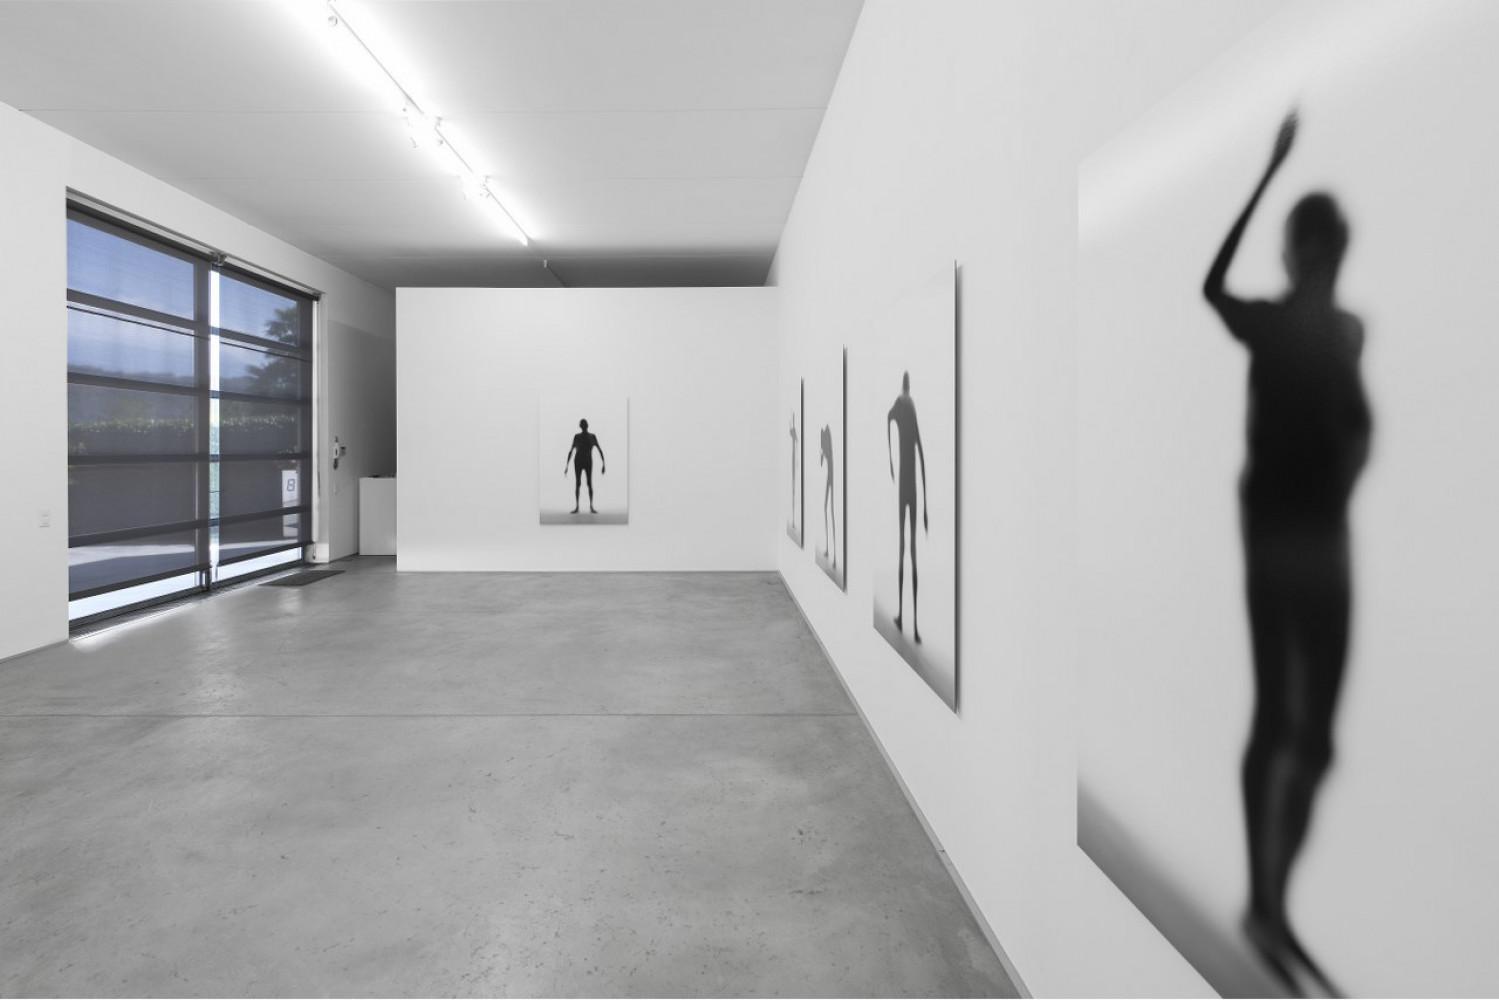 Marco D'Anna, Installation view, Buchmann Lugano